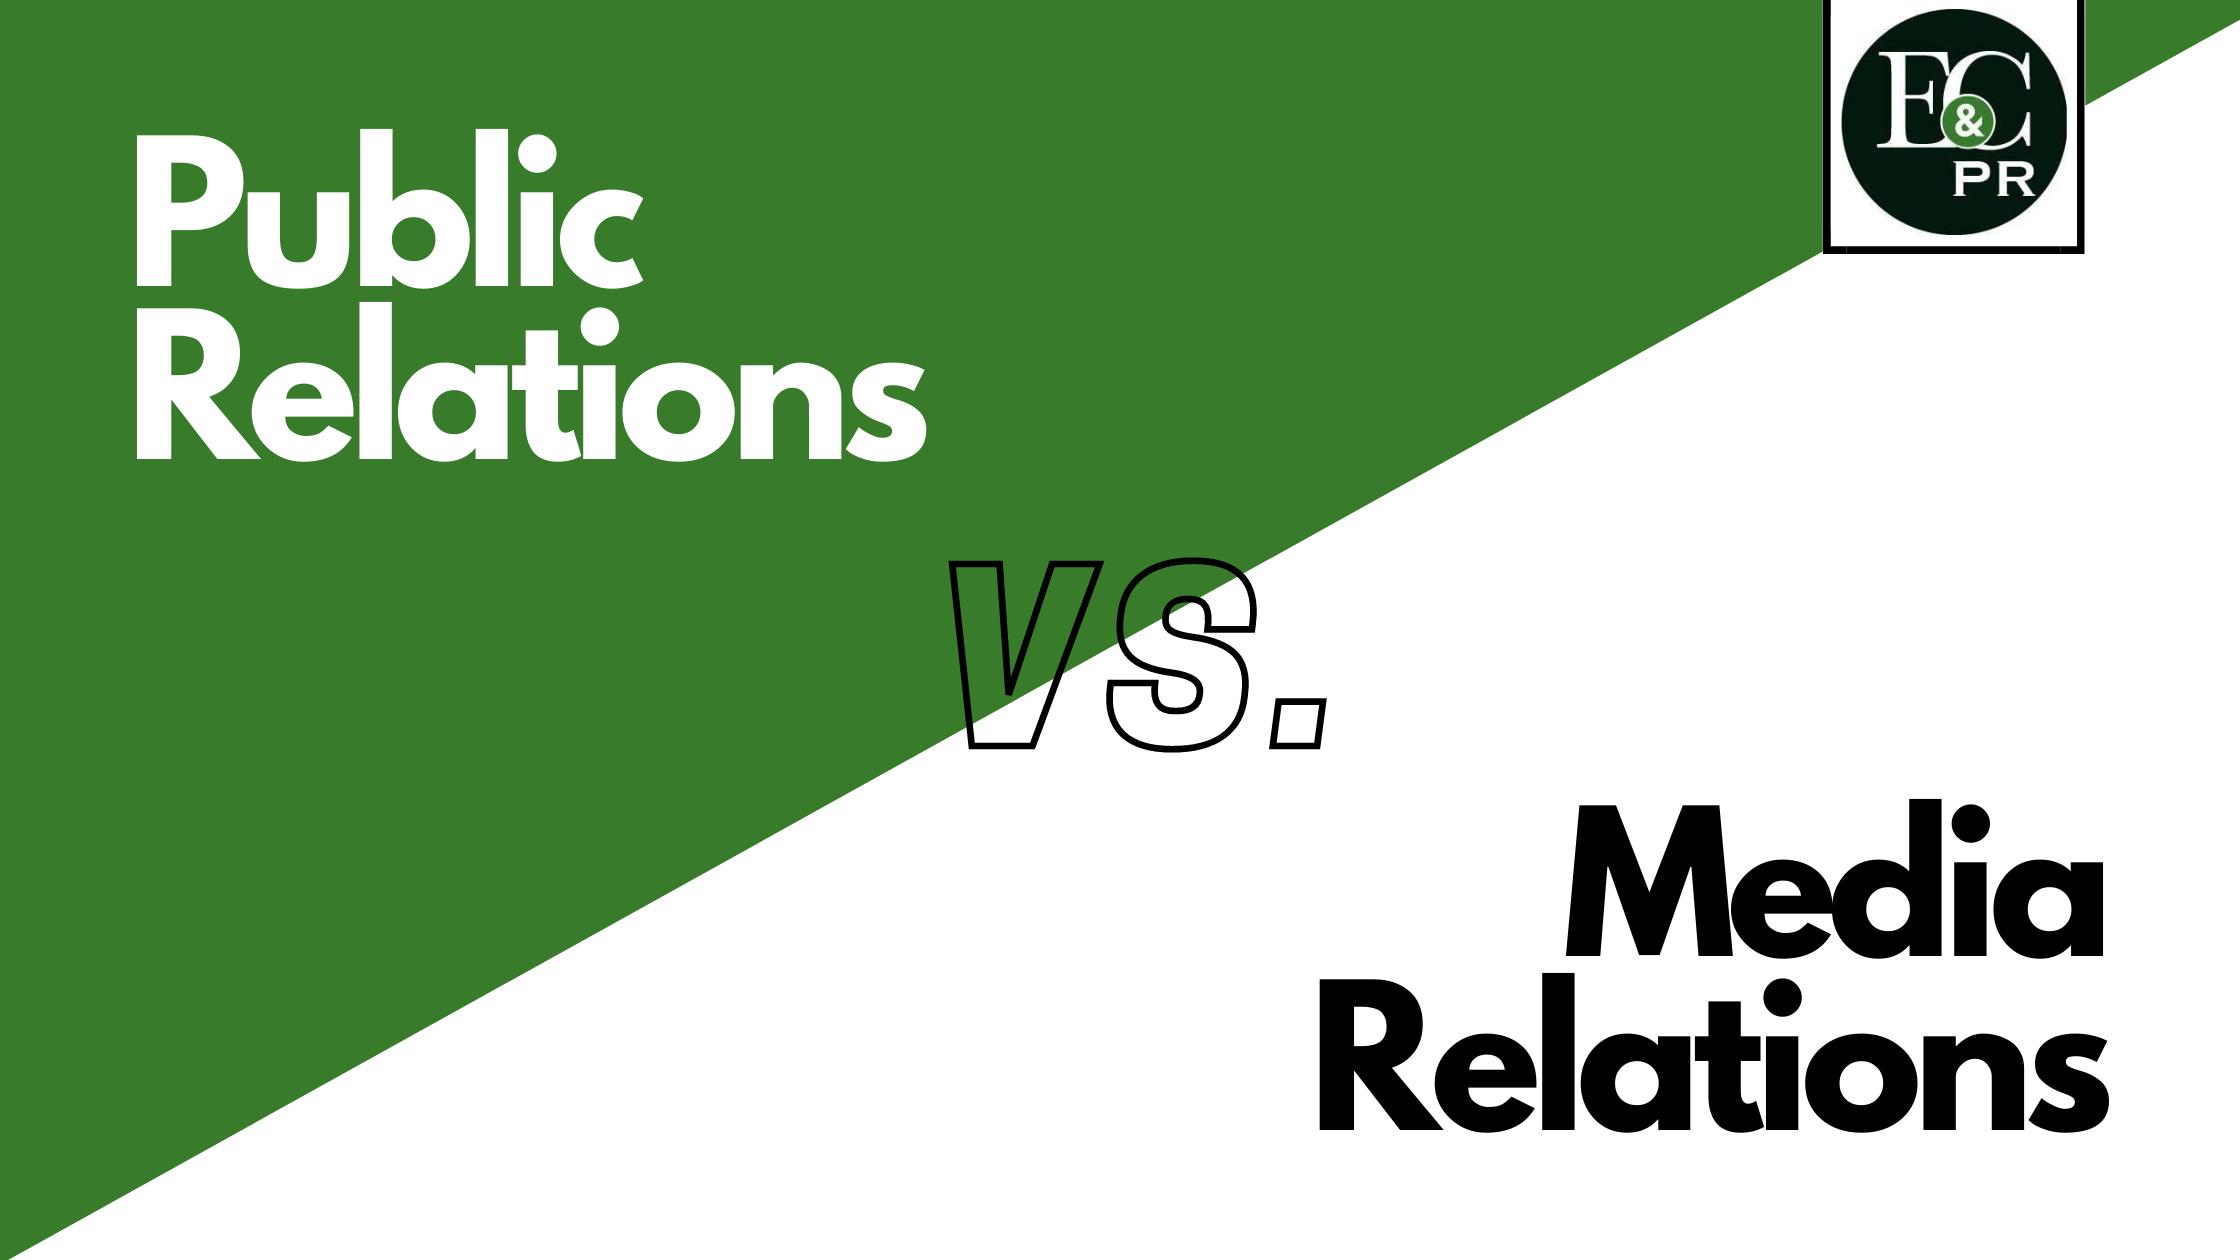 Public Relations vs. Media Relations